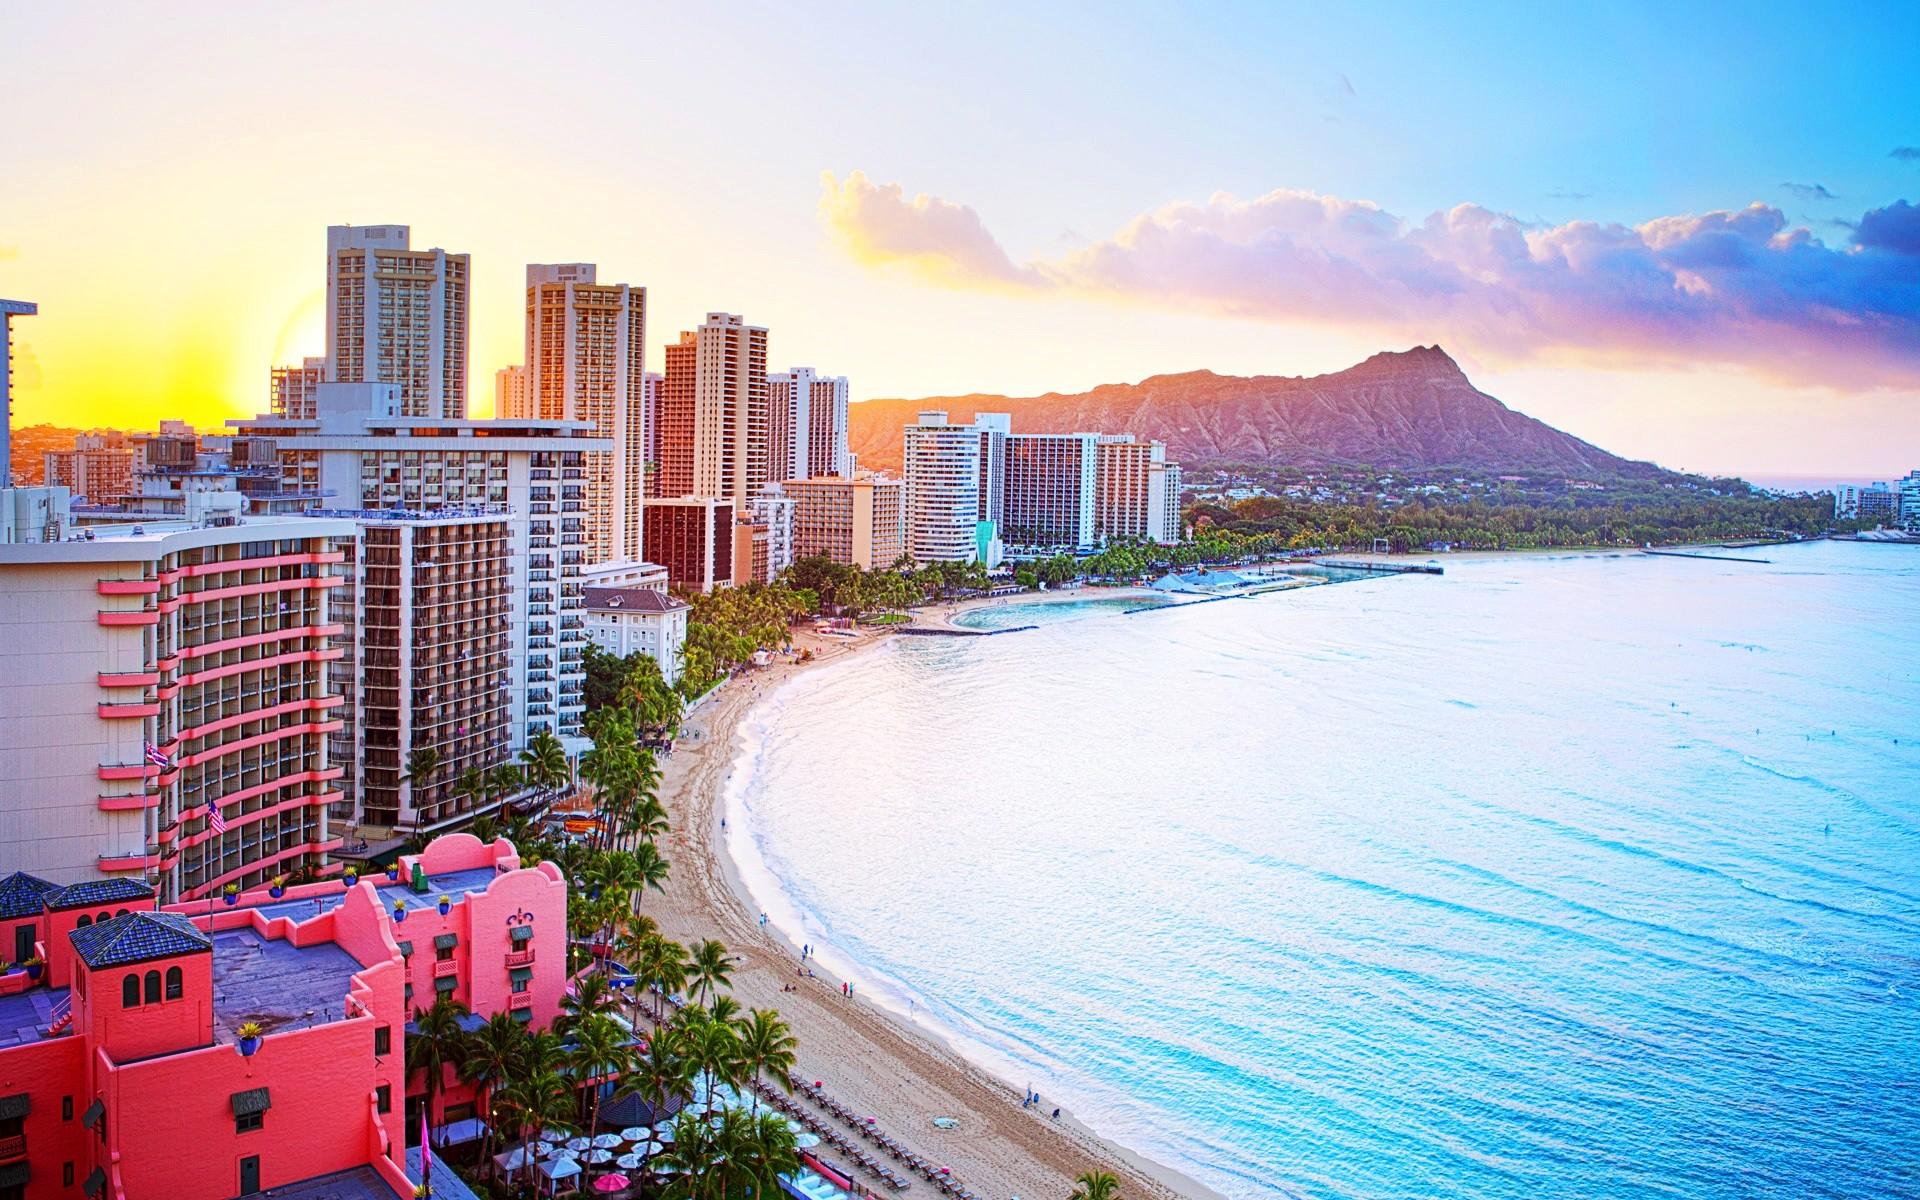 Hawaii Screensavers Wallpaper 56 images 1920x1200